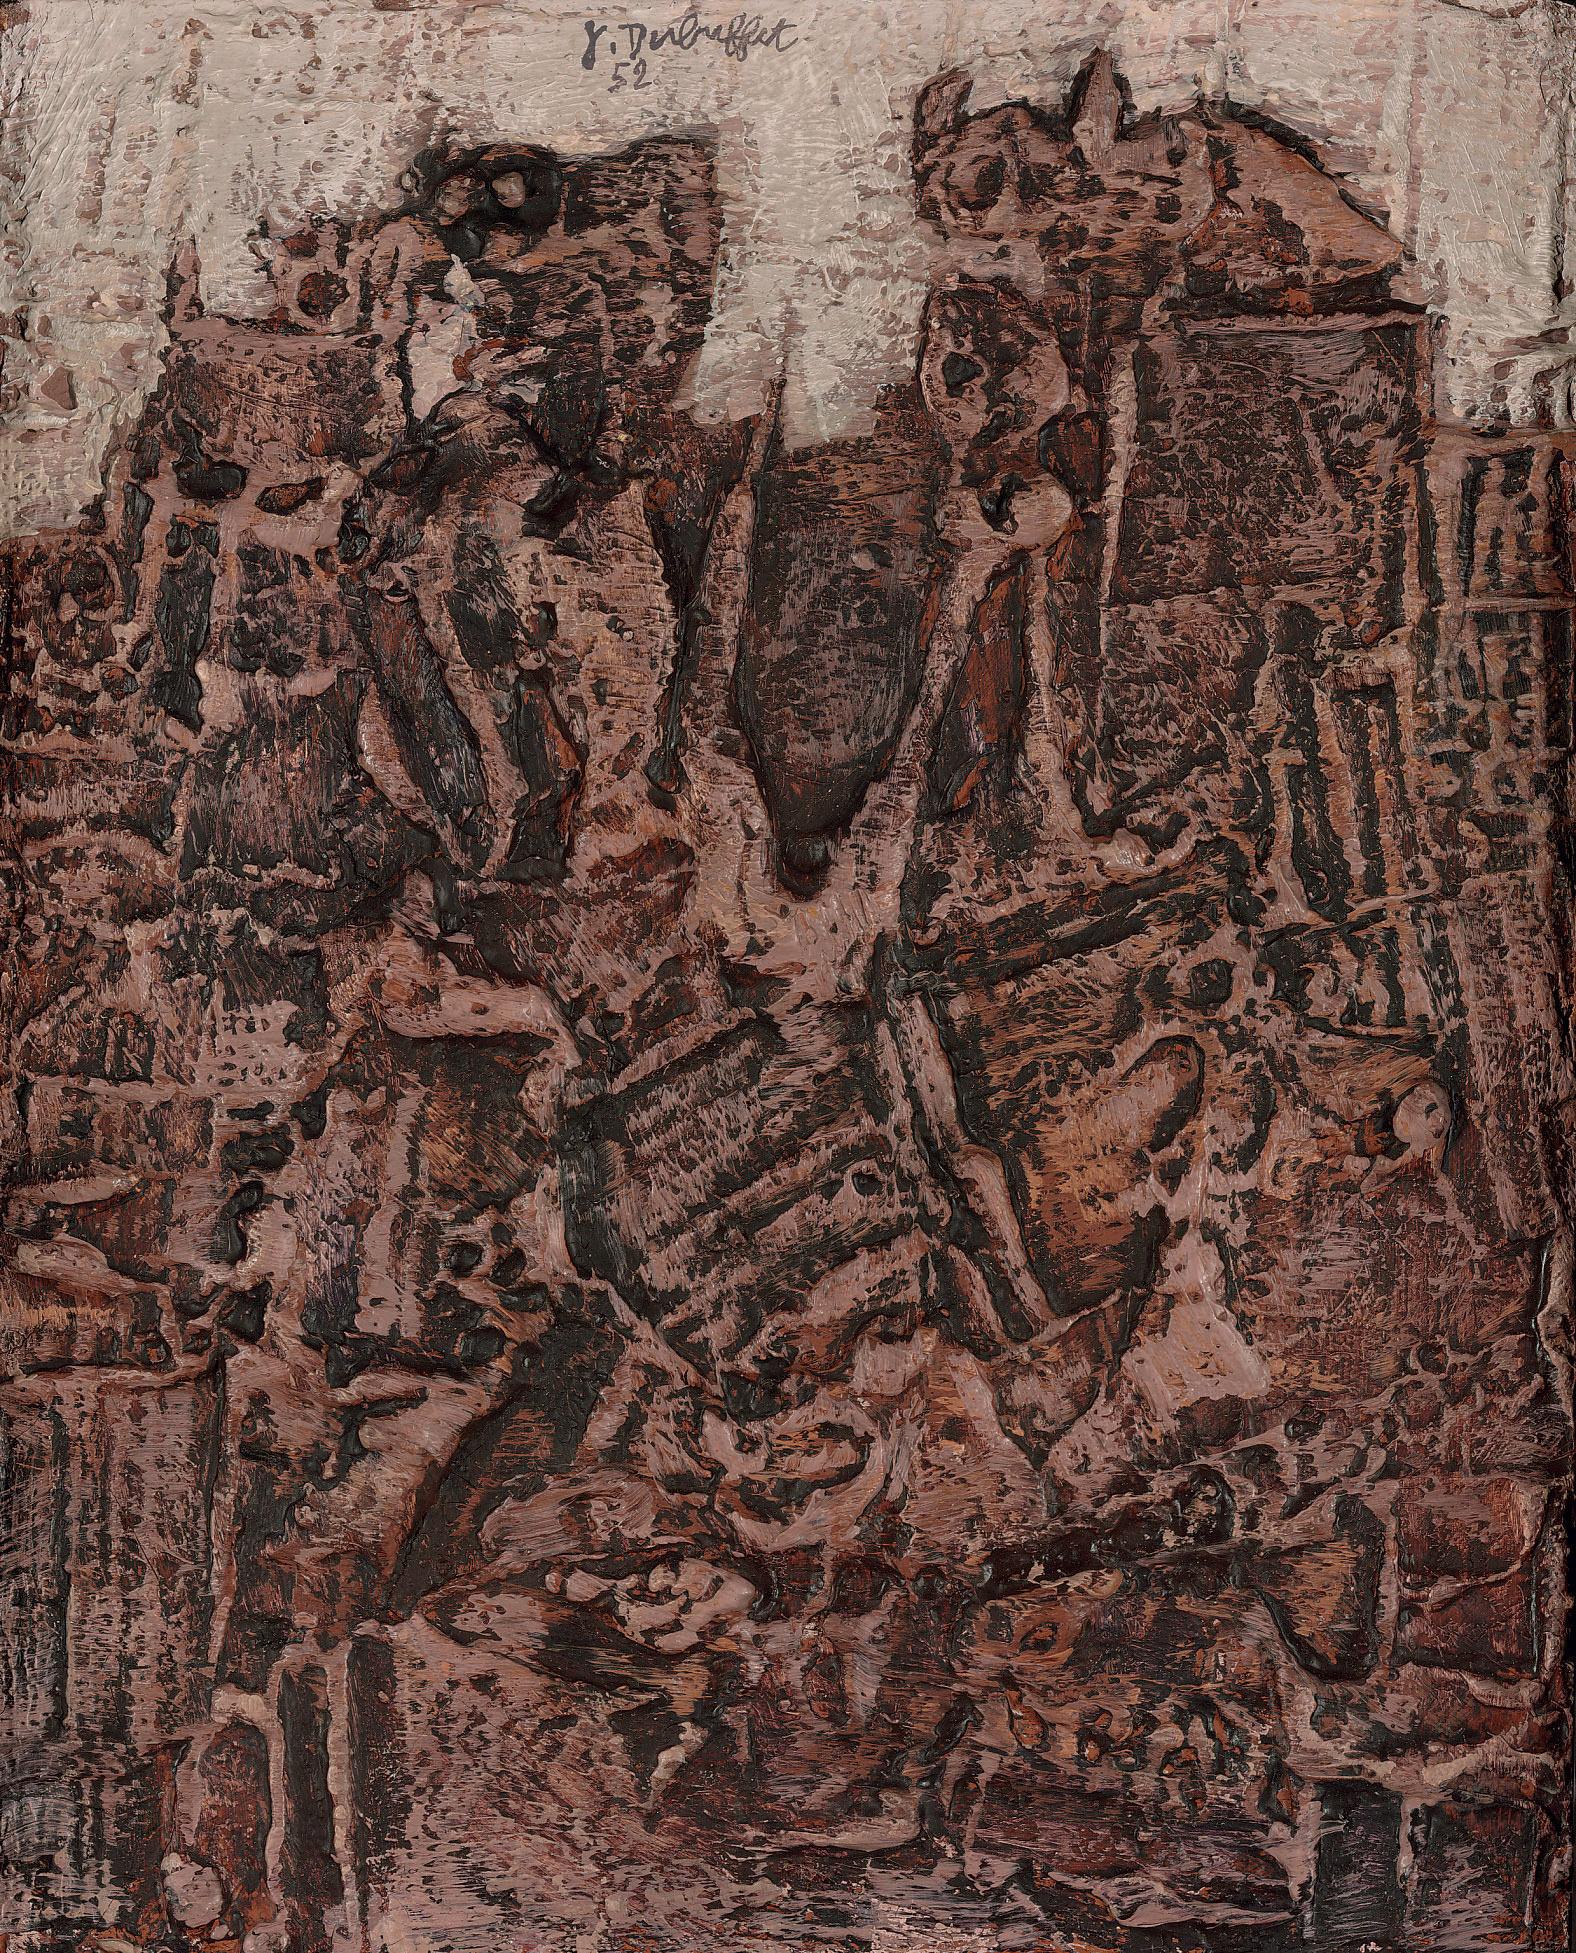 Jean Dubuffet 1901 1985 Chat Perchie 1950s Paintings Christies Delfit Lot 309